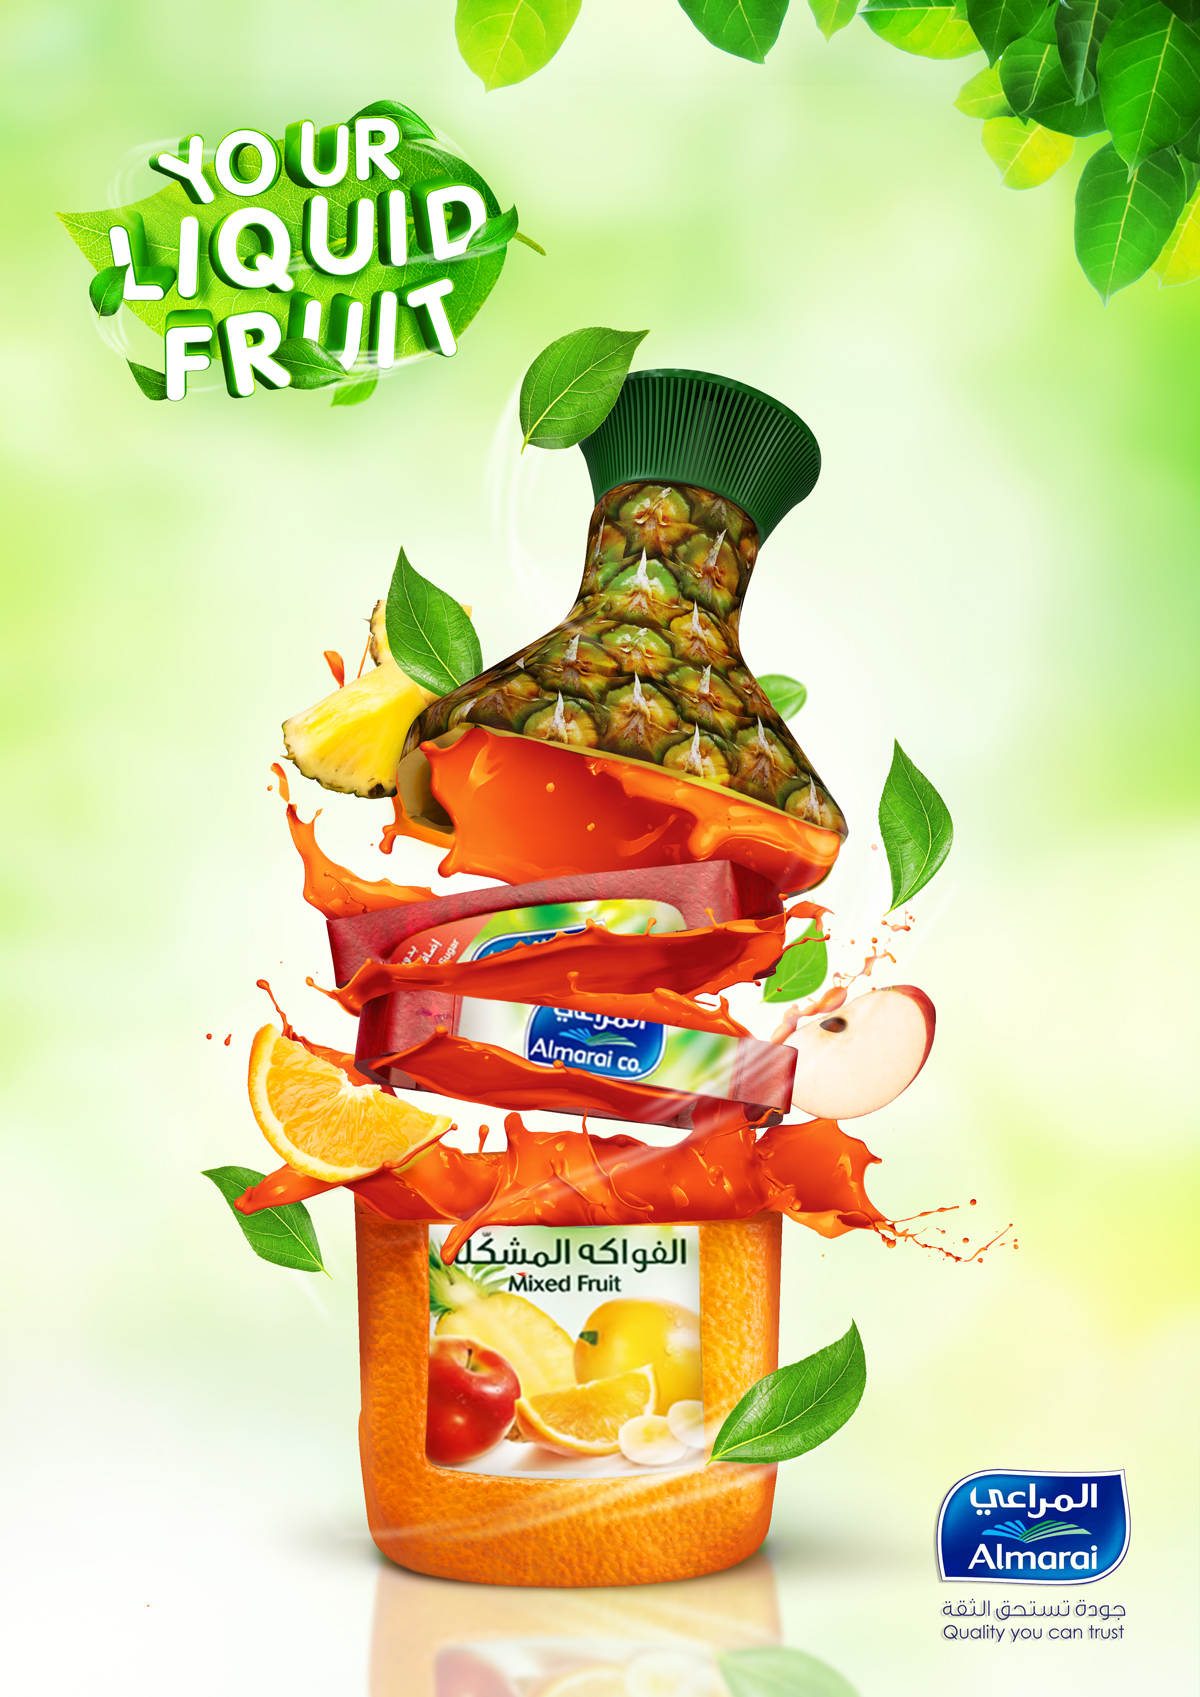 Your liquid fruit on Behance